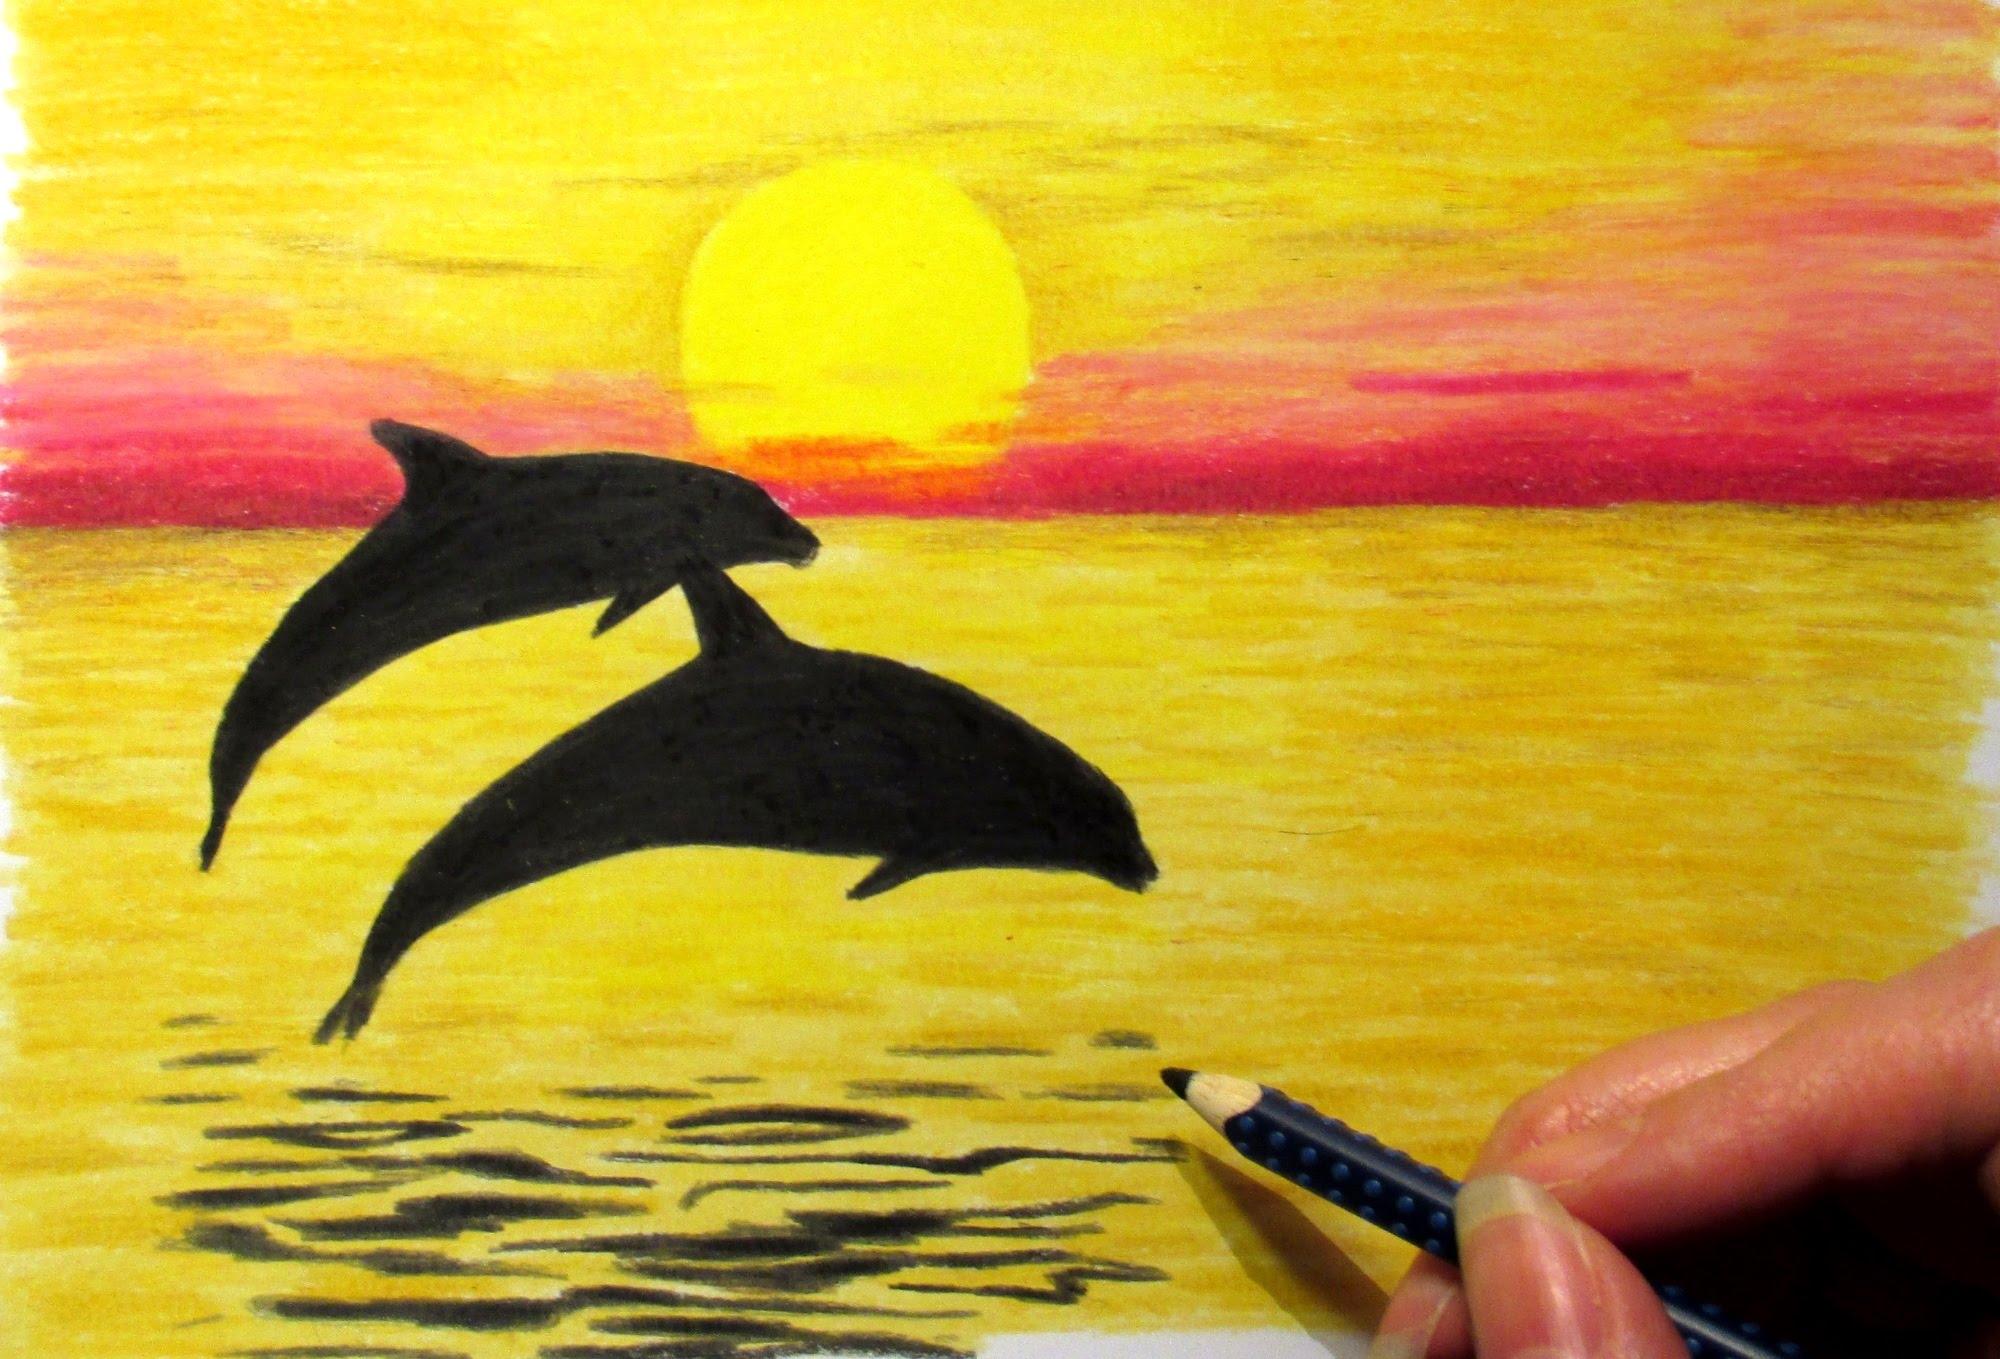 Drawn scenery sunrise Drawing 2 Of Scenery